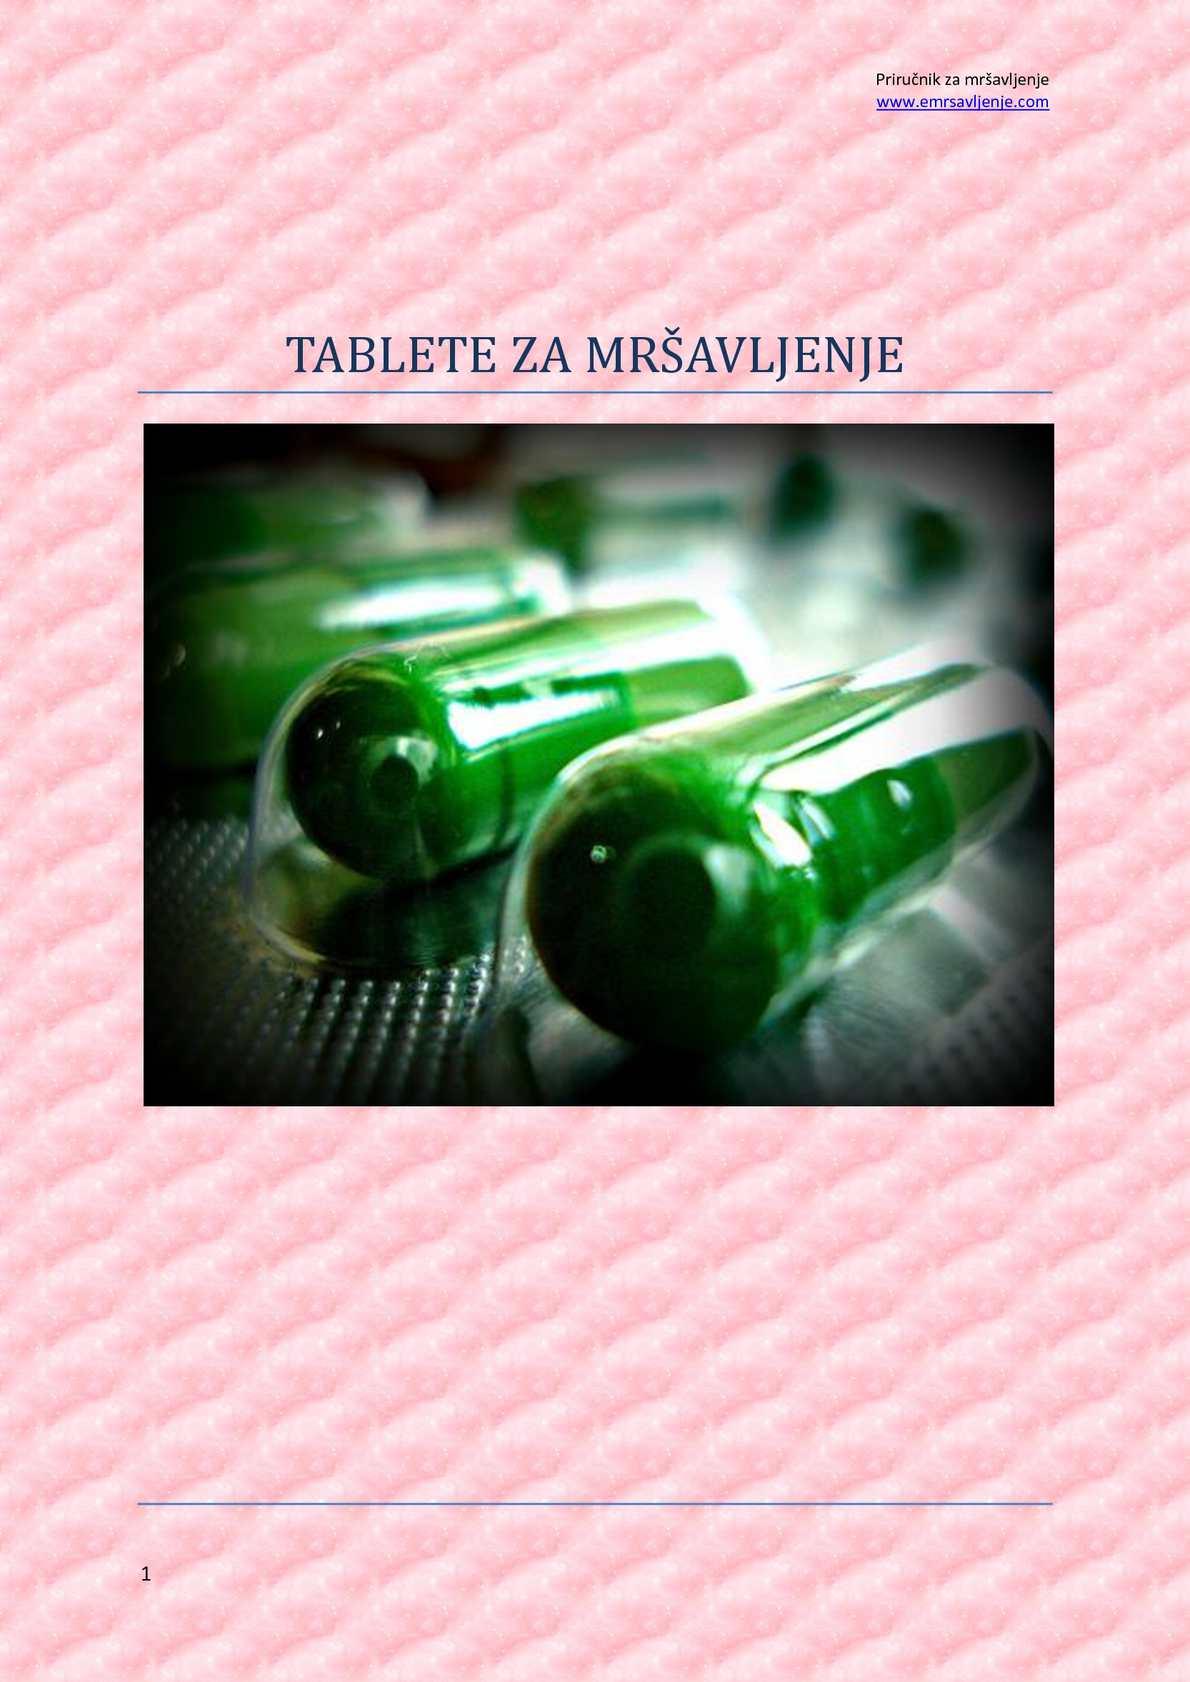 vitka tableta za mršavljenje